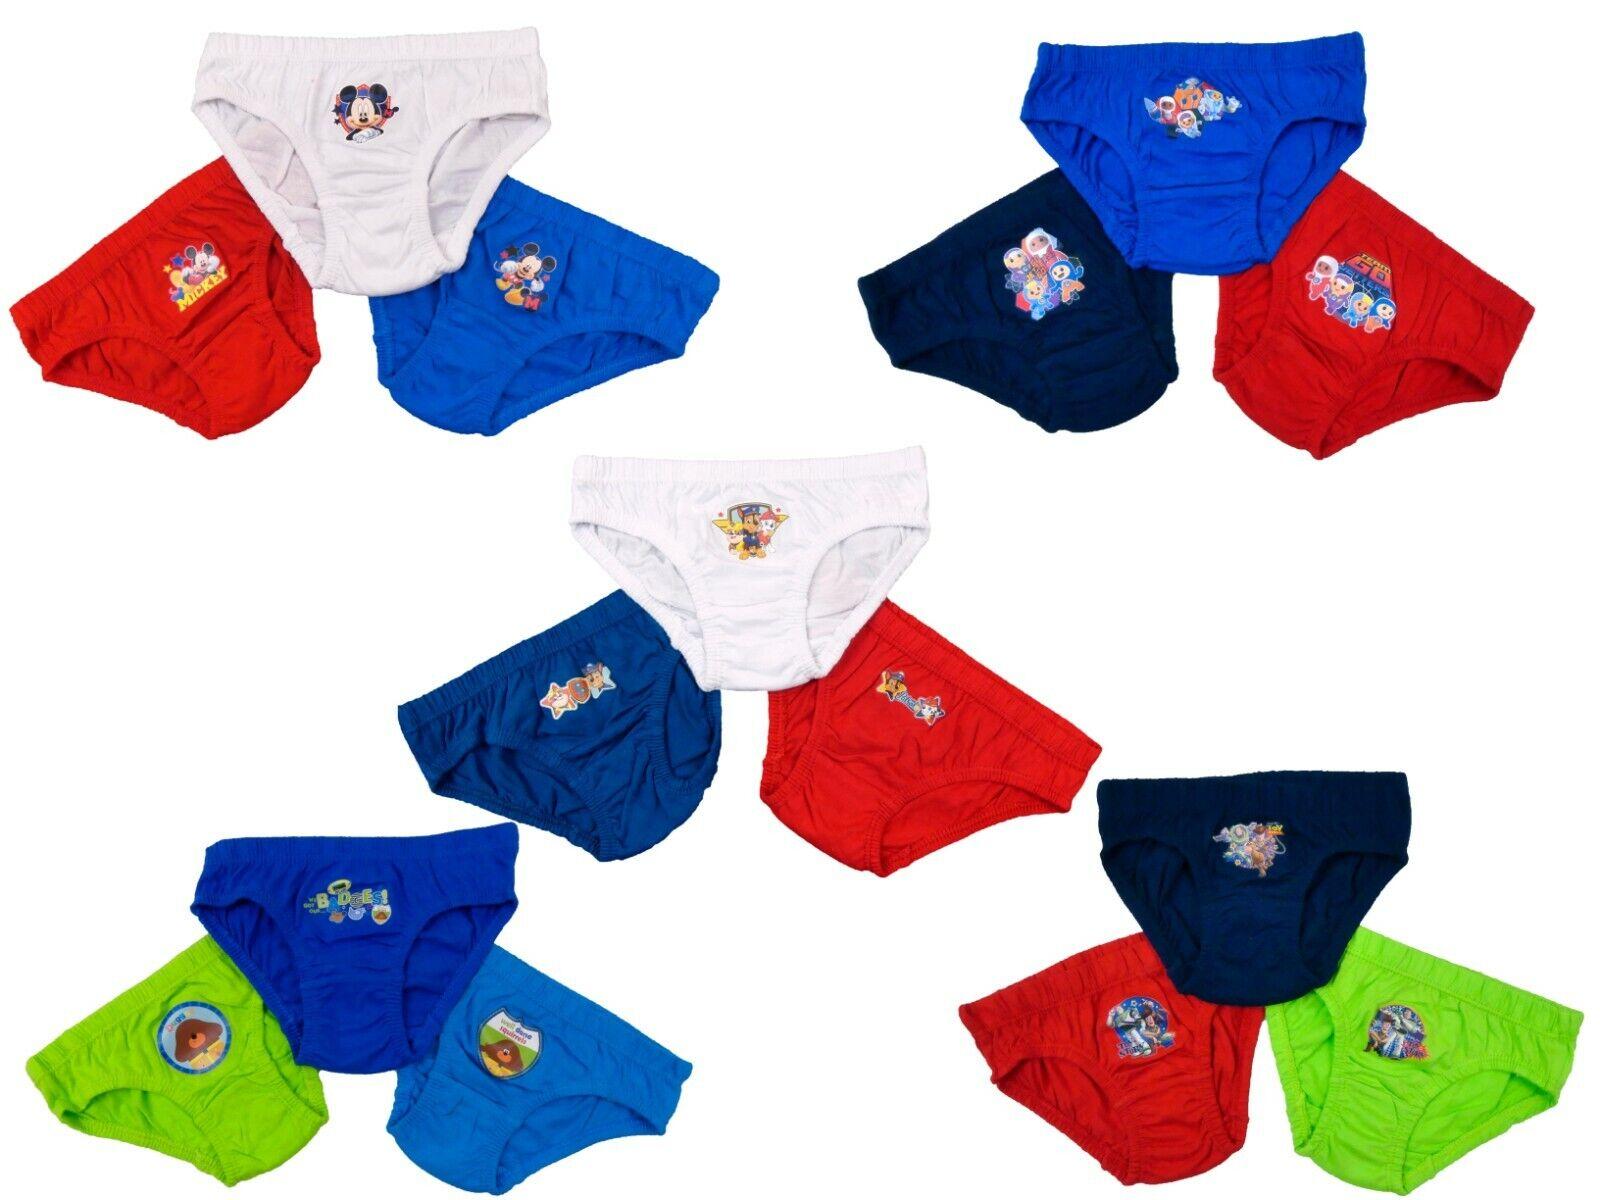 Sizes 18 Months-5 Years Boys GO JETTERS Briefs//Pants /& Vests Set A